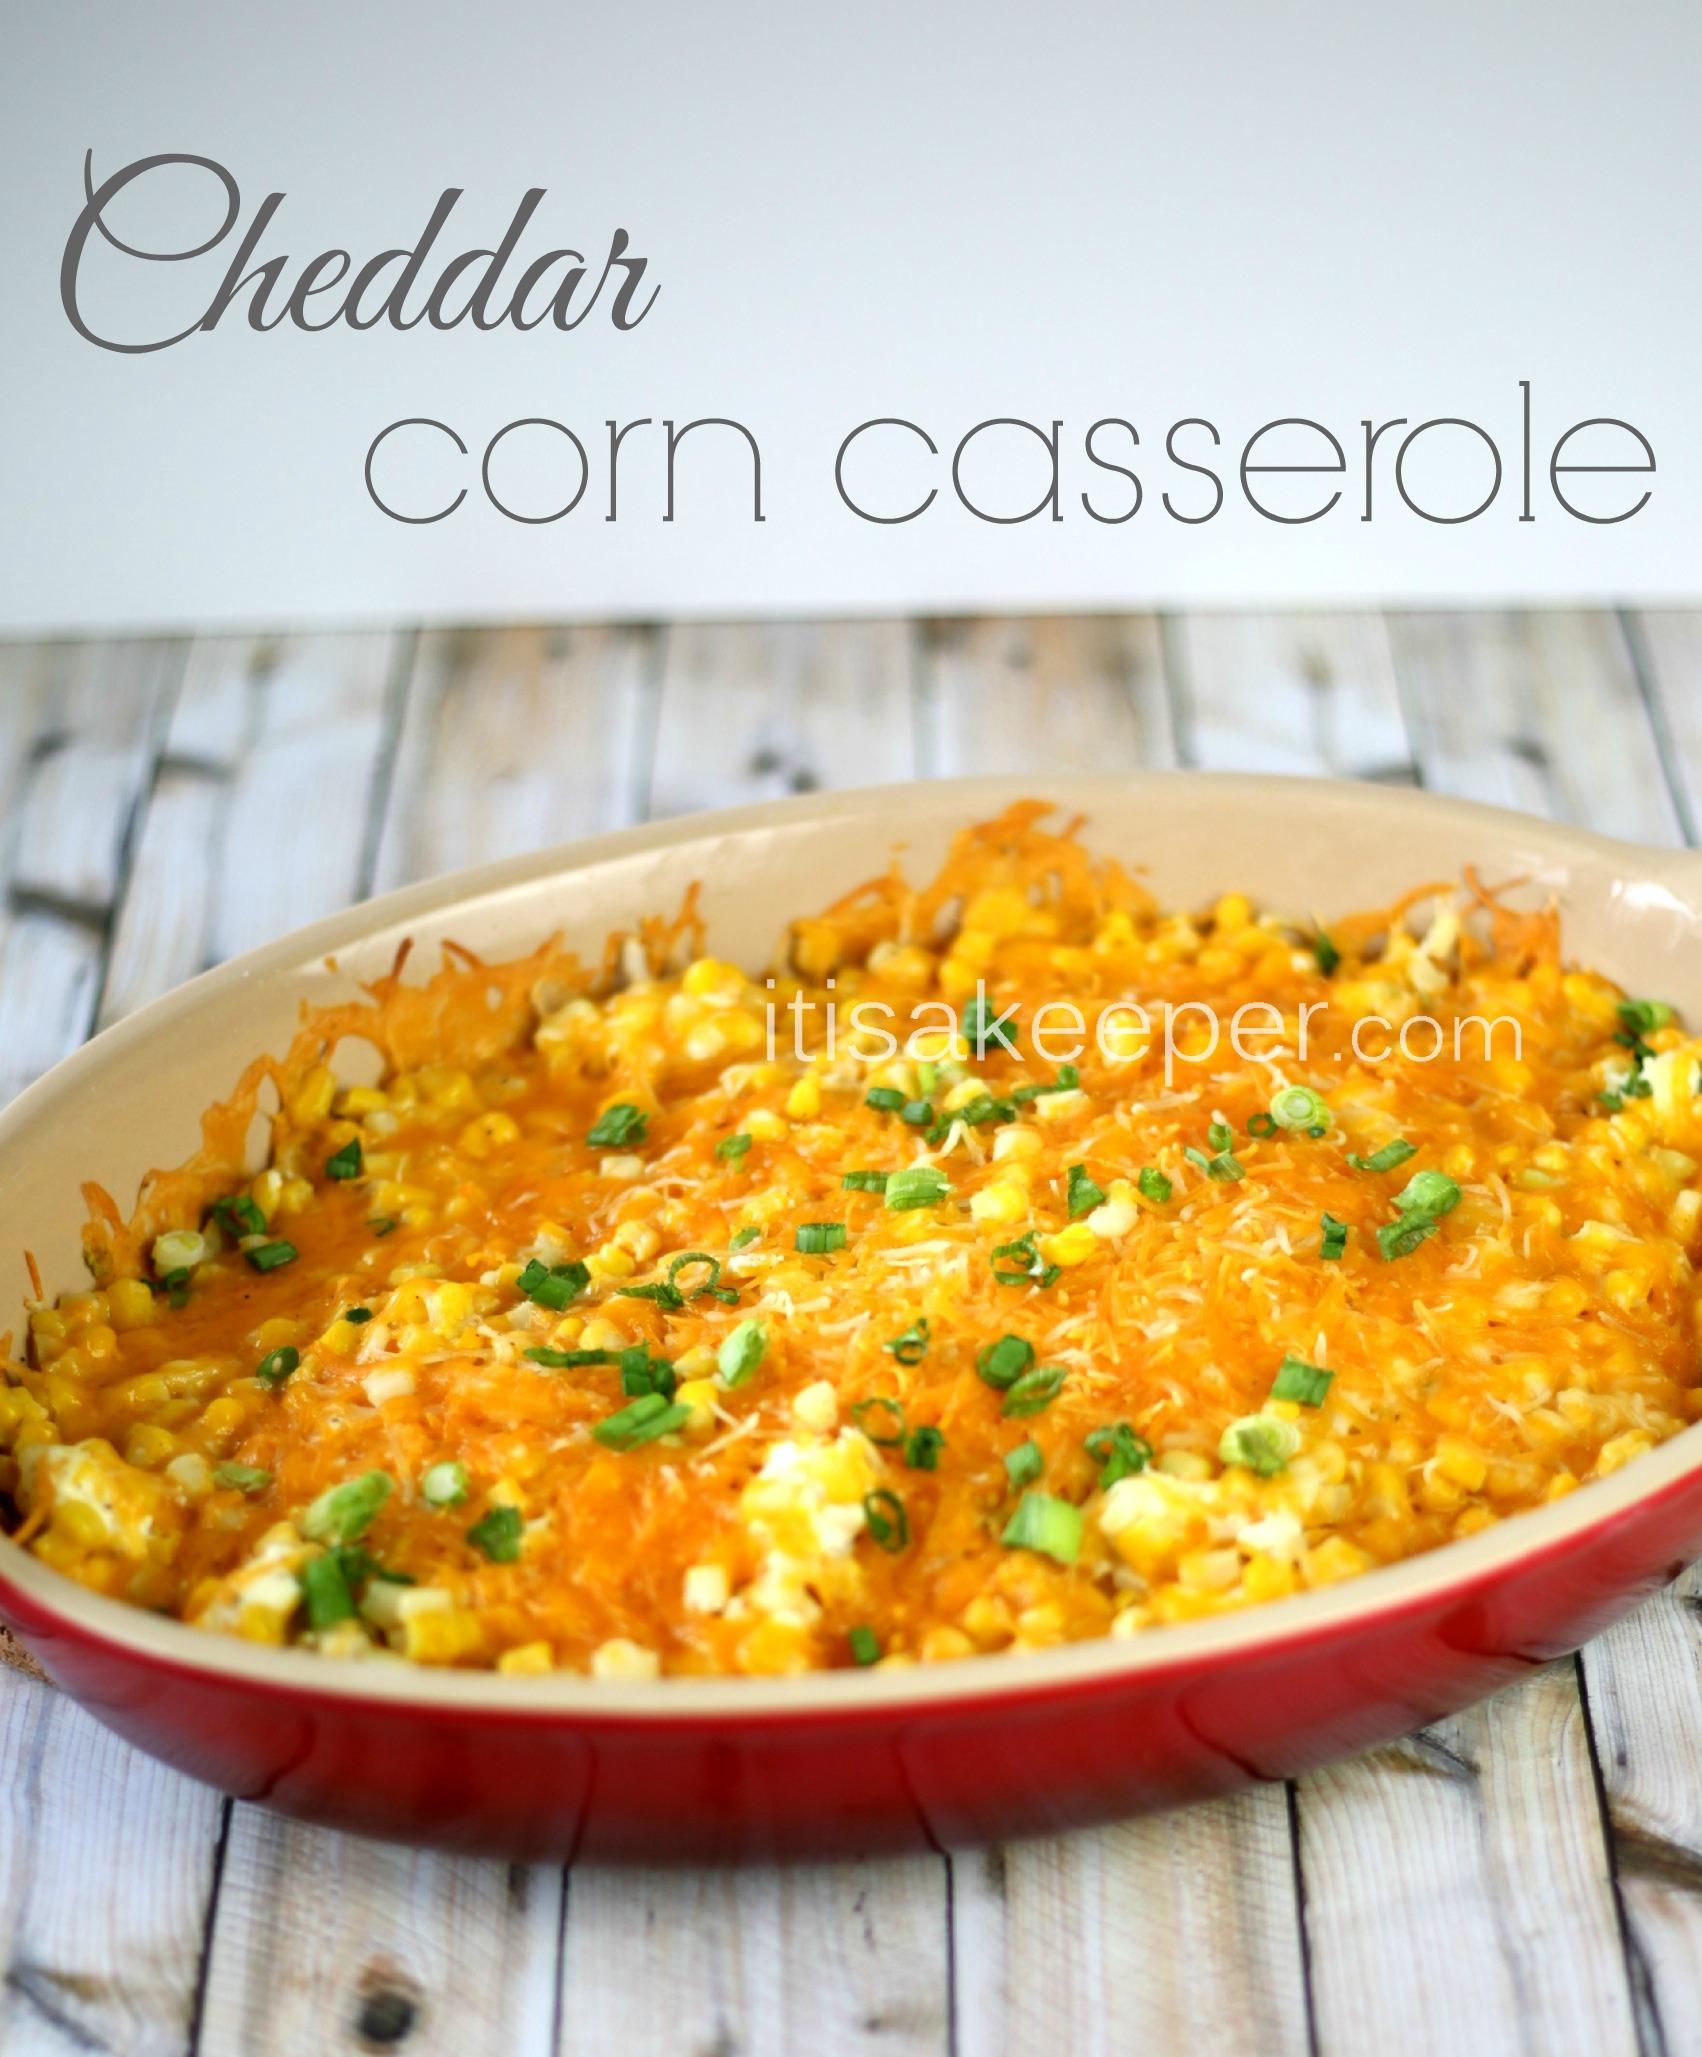 Simple Casserole Recipes: Super Easy Recipes: Cheddar Corn Casserole